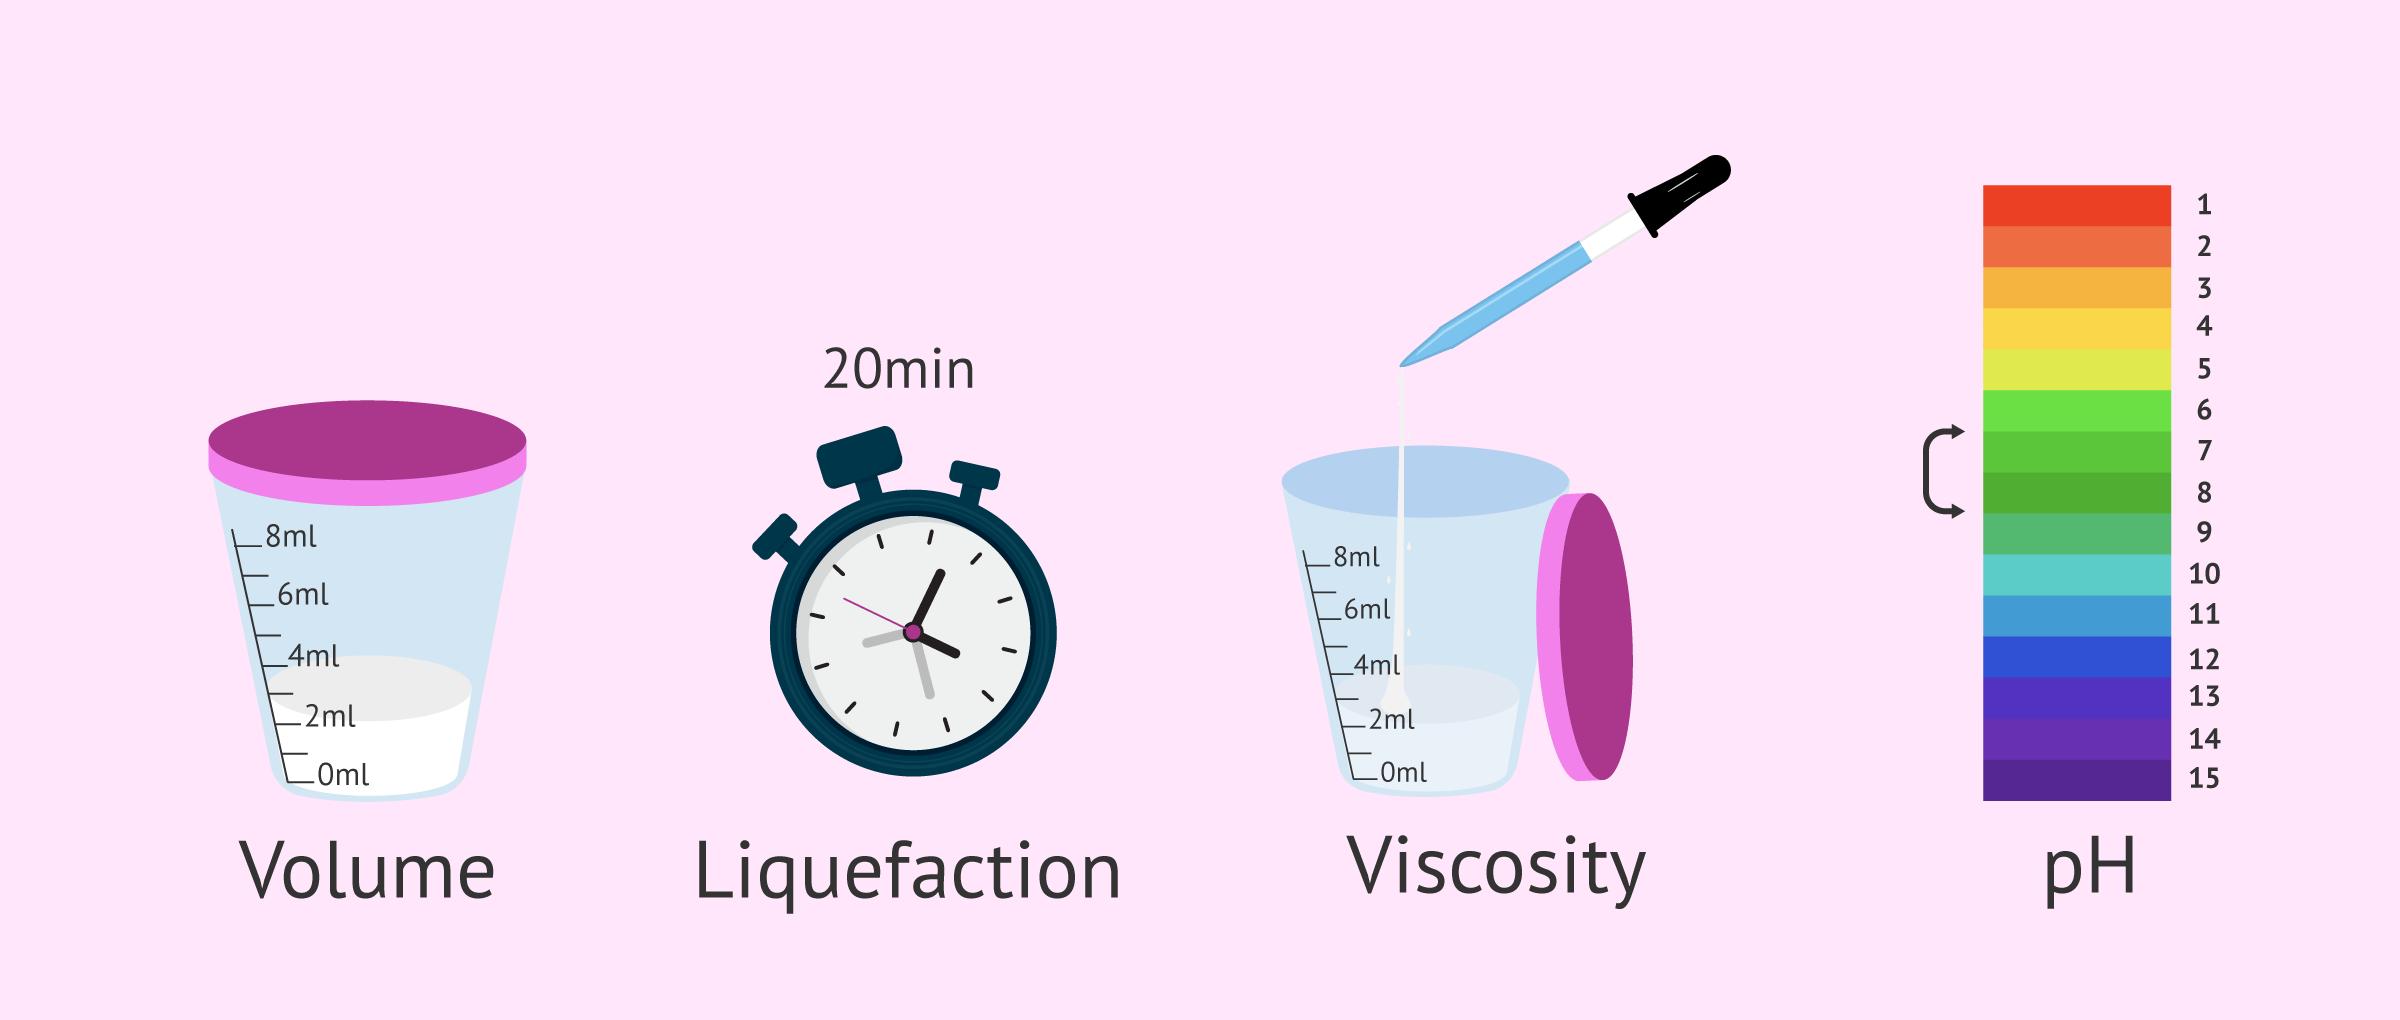 Macroscopic analysis of semen sample